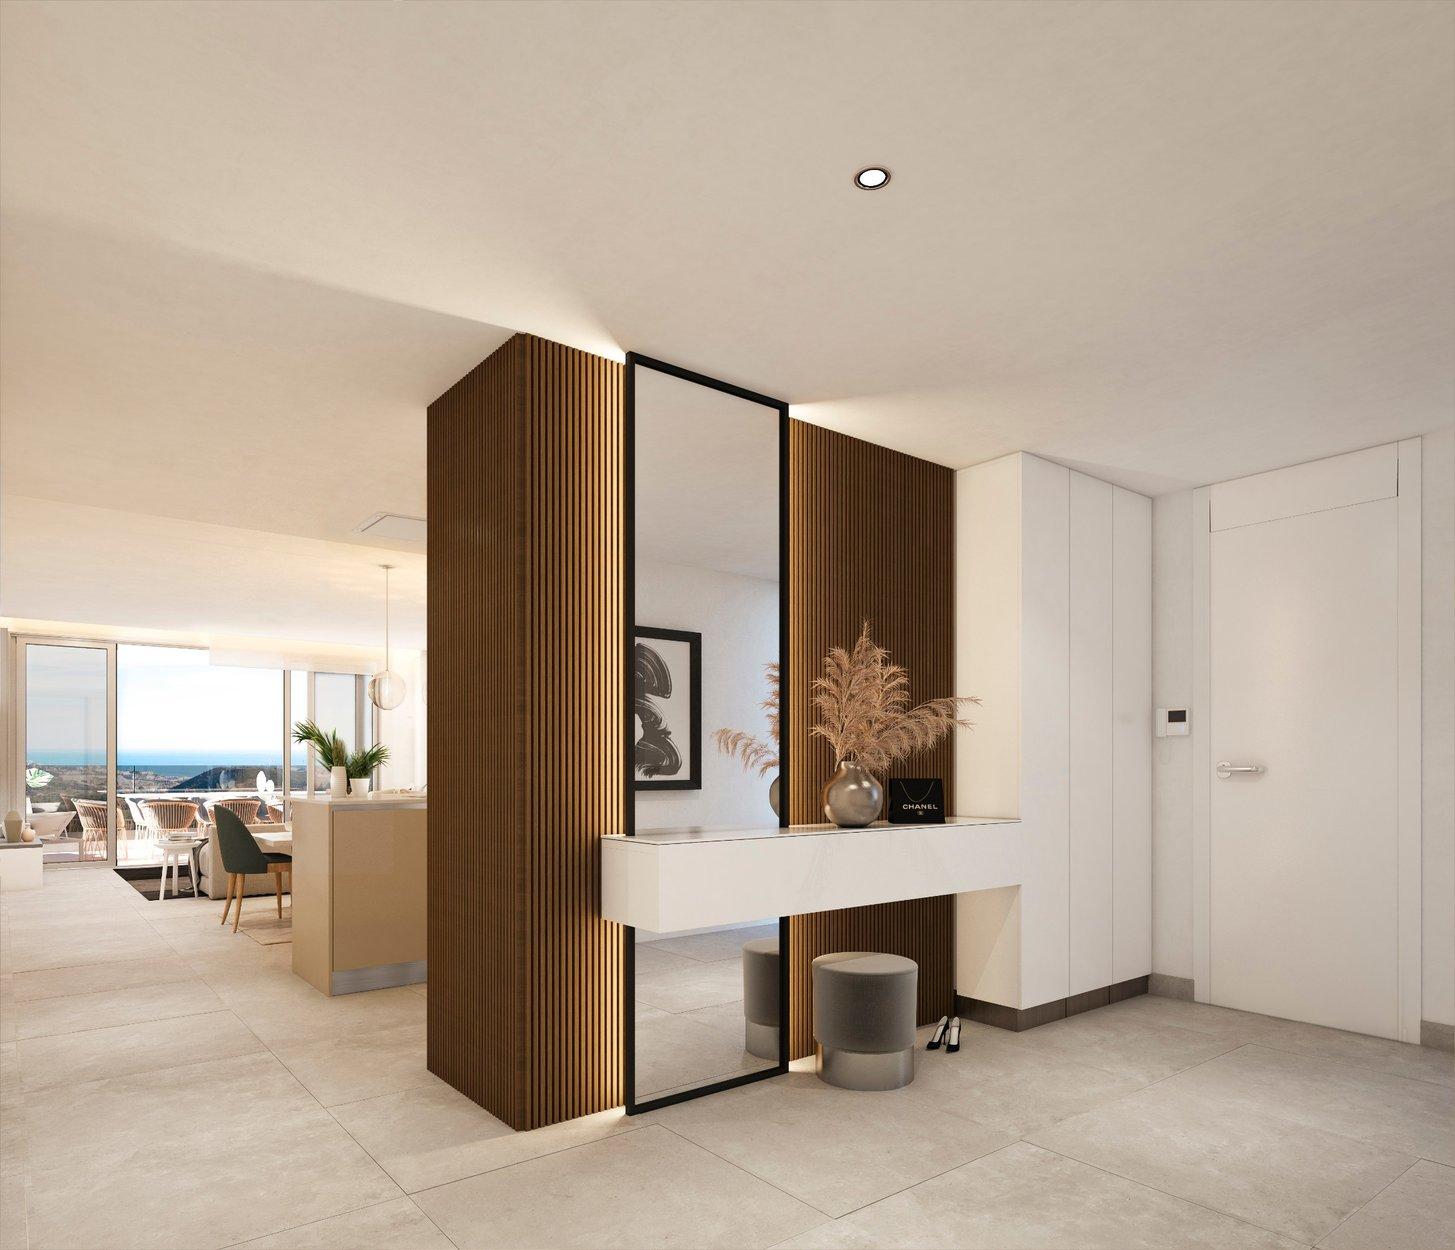 3 Room Apartment: 3 Bedroom, 3 Bathroom Apartment For Sale In La Cala De